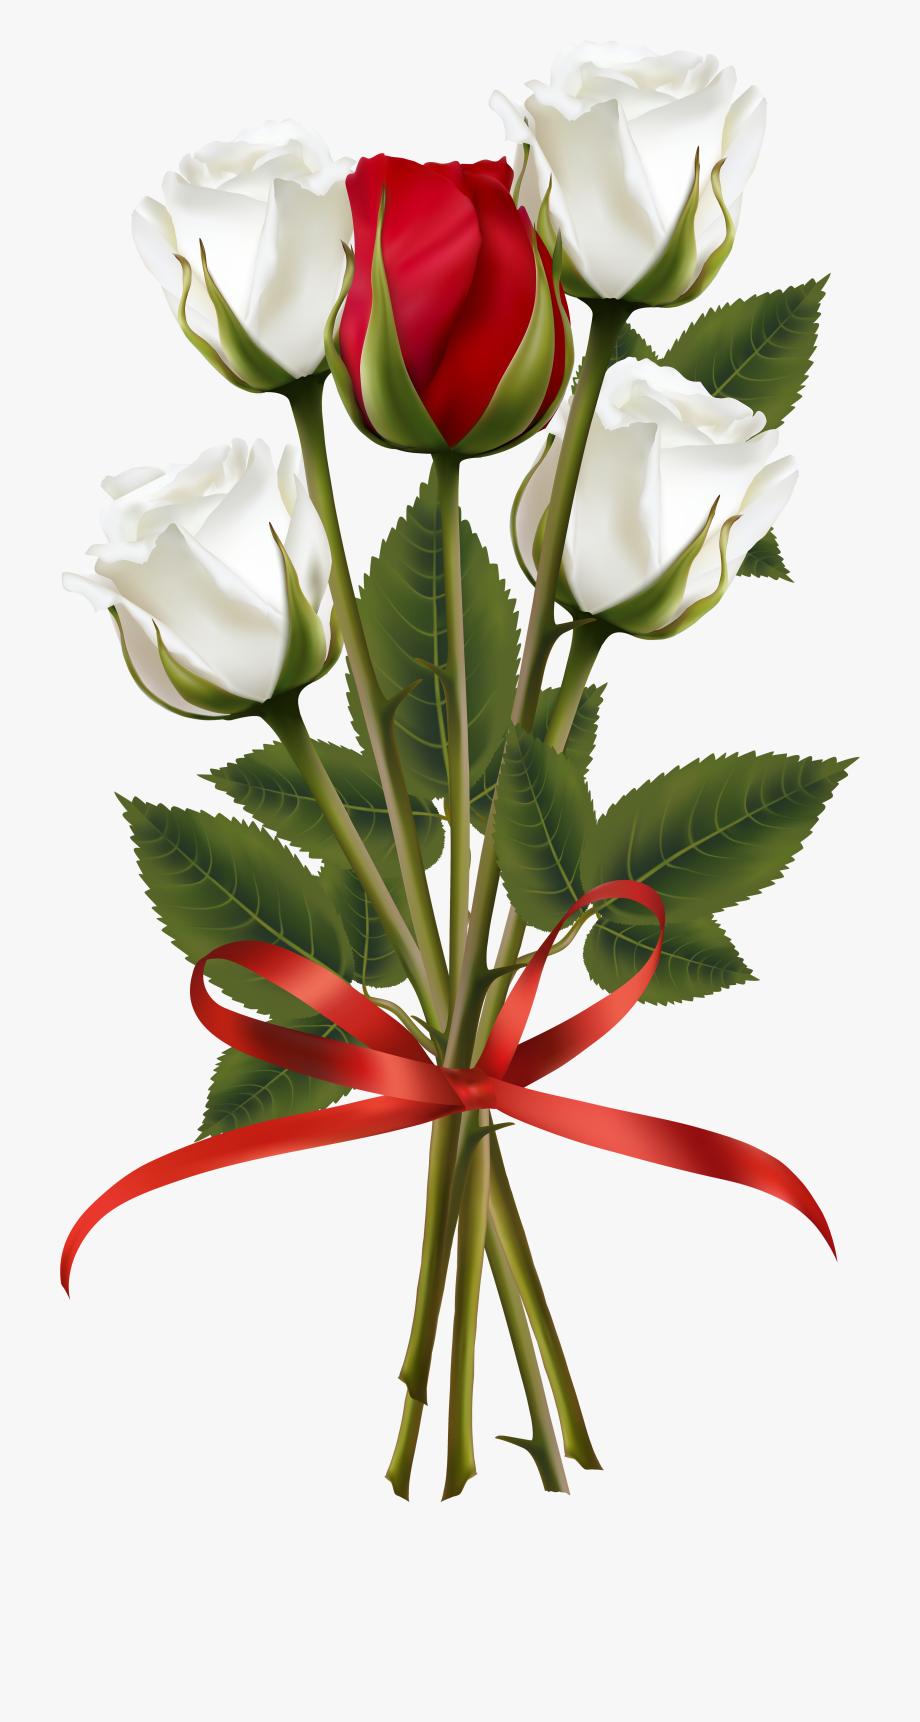 Bouquet of roses clipart svg download Flower Bouquet Rose Red Clip Art - Transparent Flower Bouquet Png ... svg download